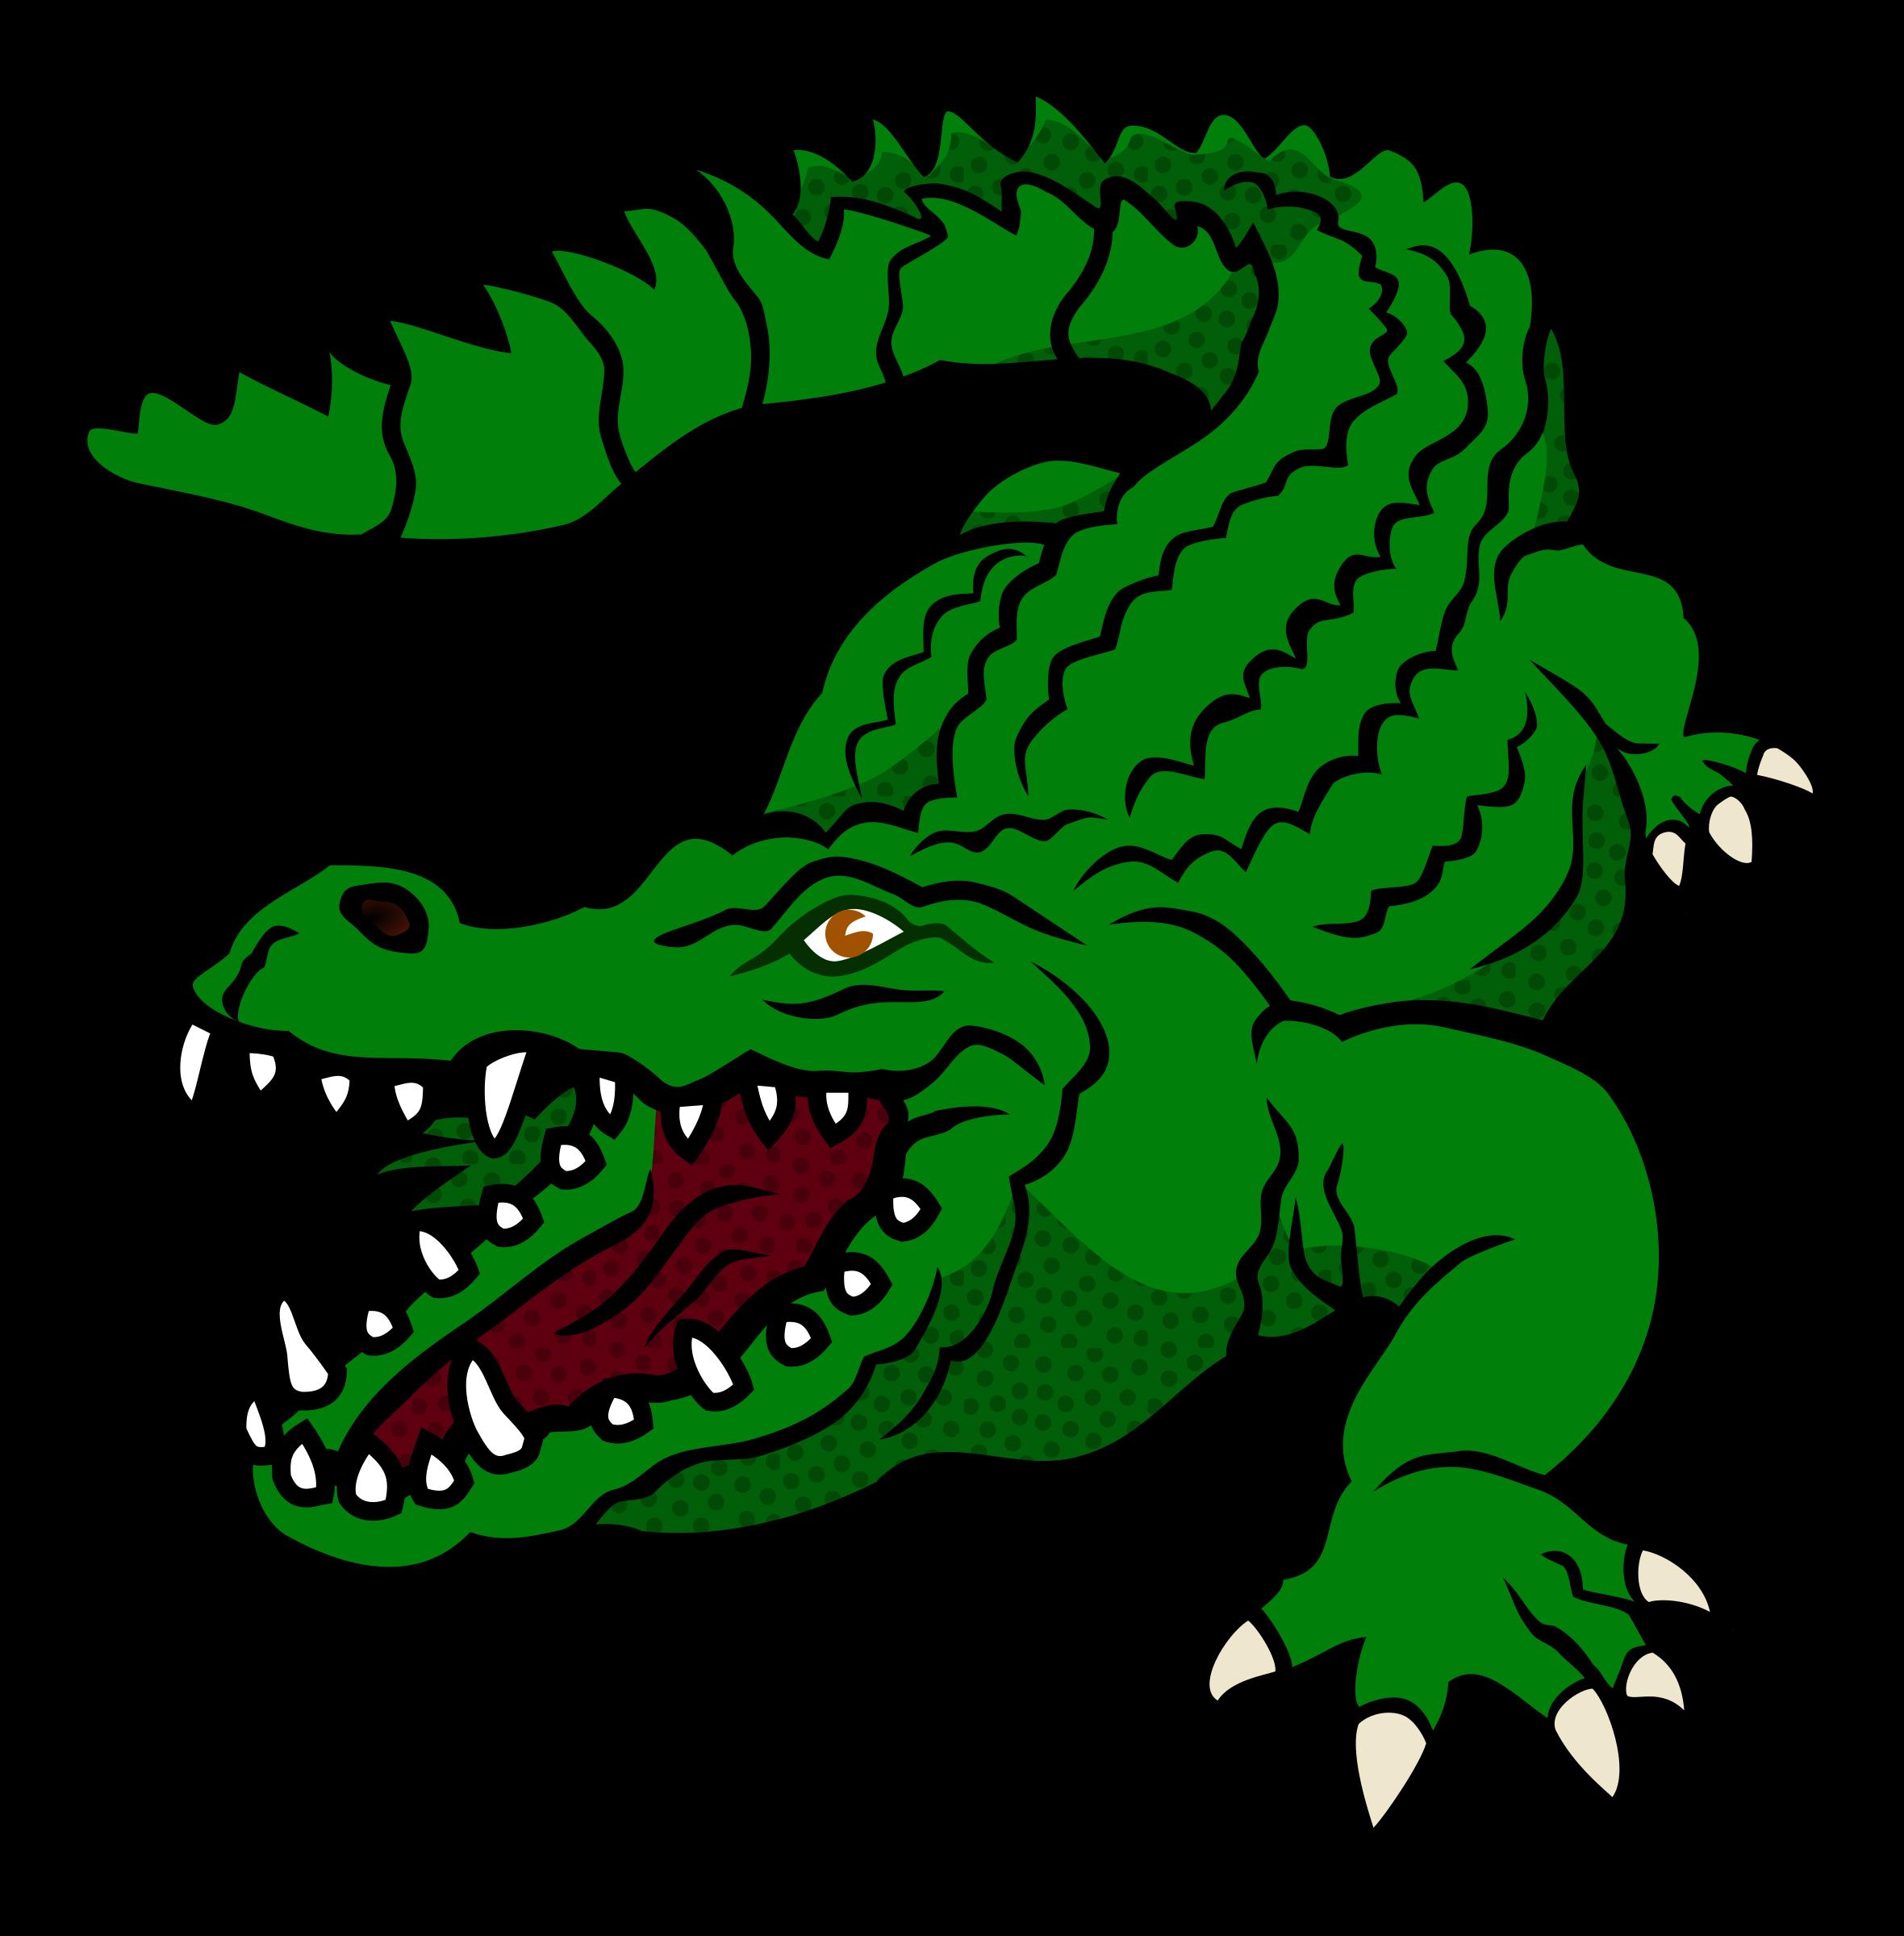 Cake design graphics illustrations. Alligator clipart animated